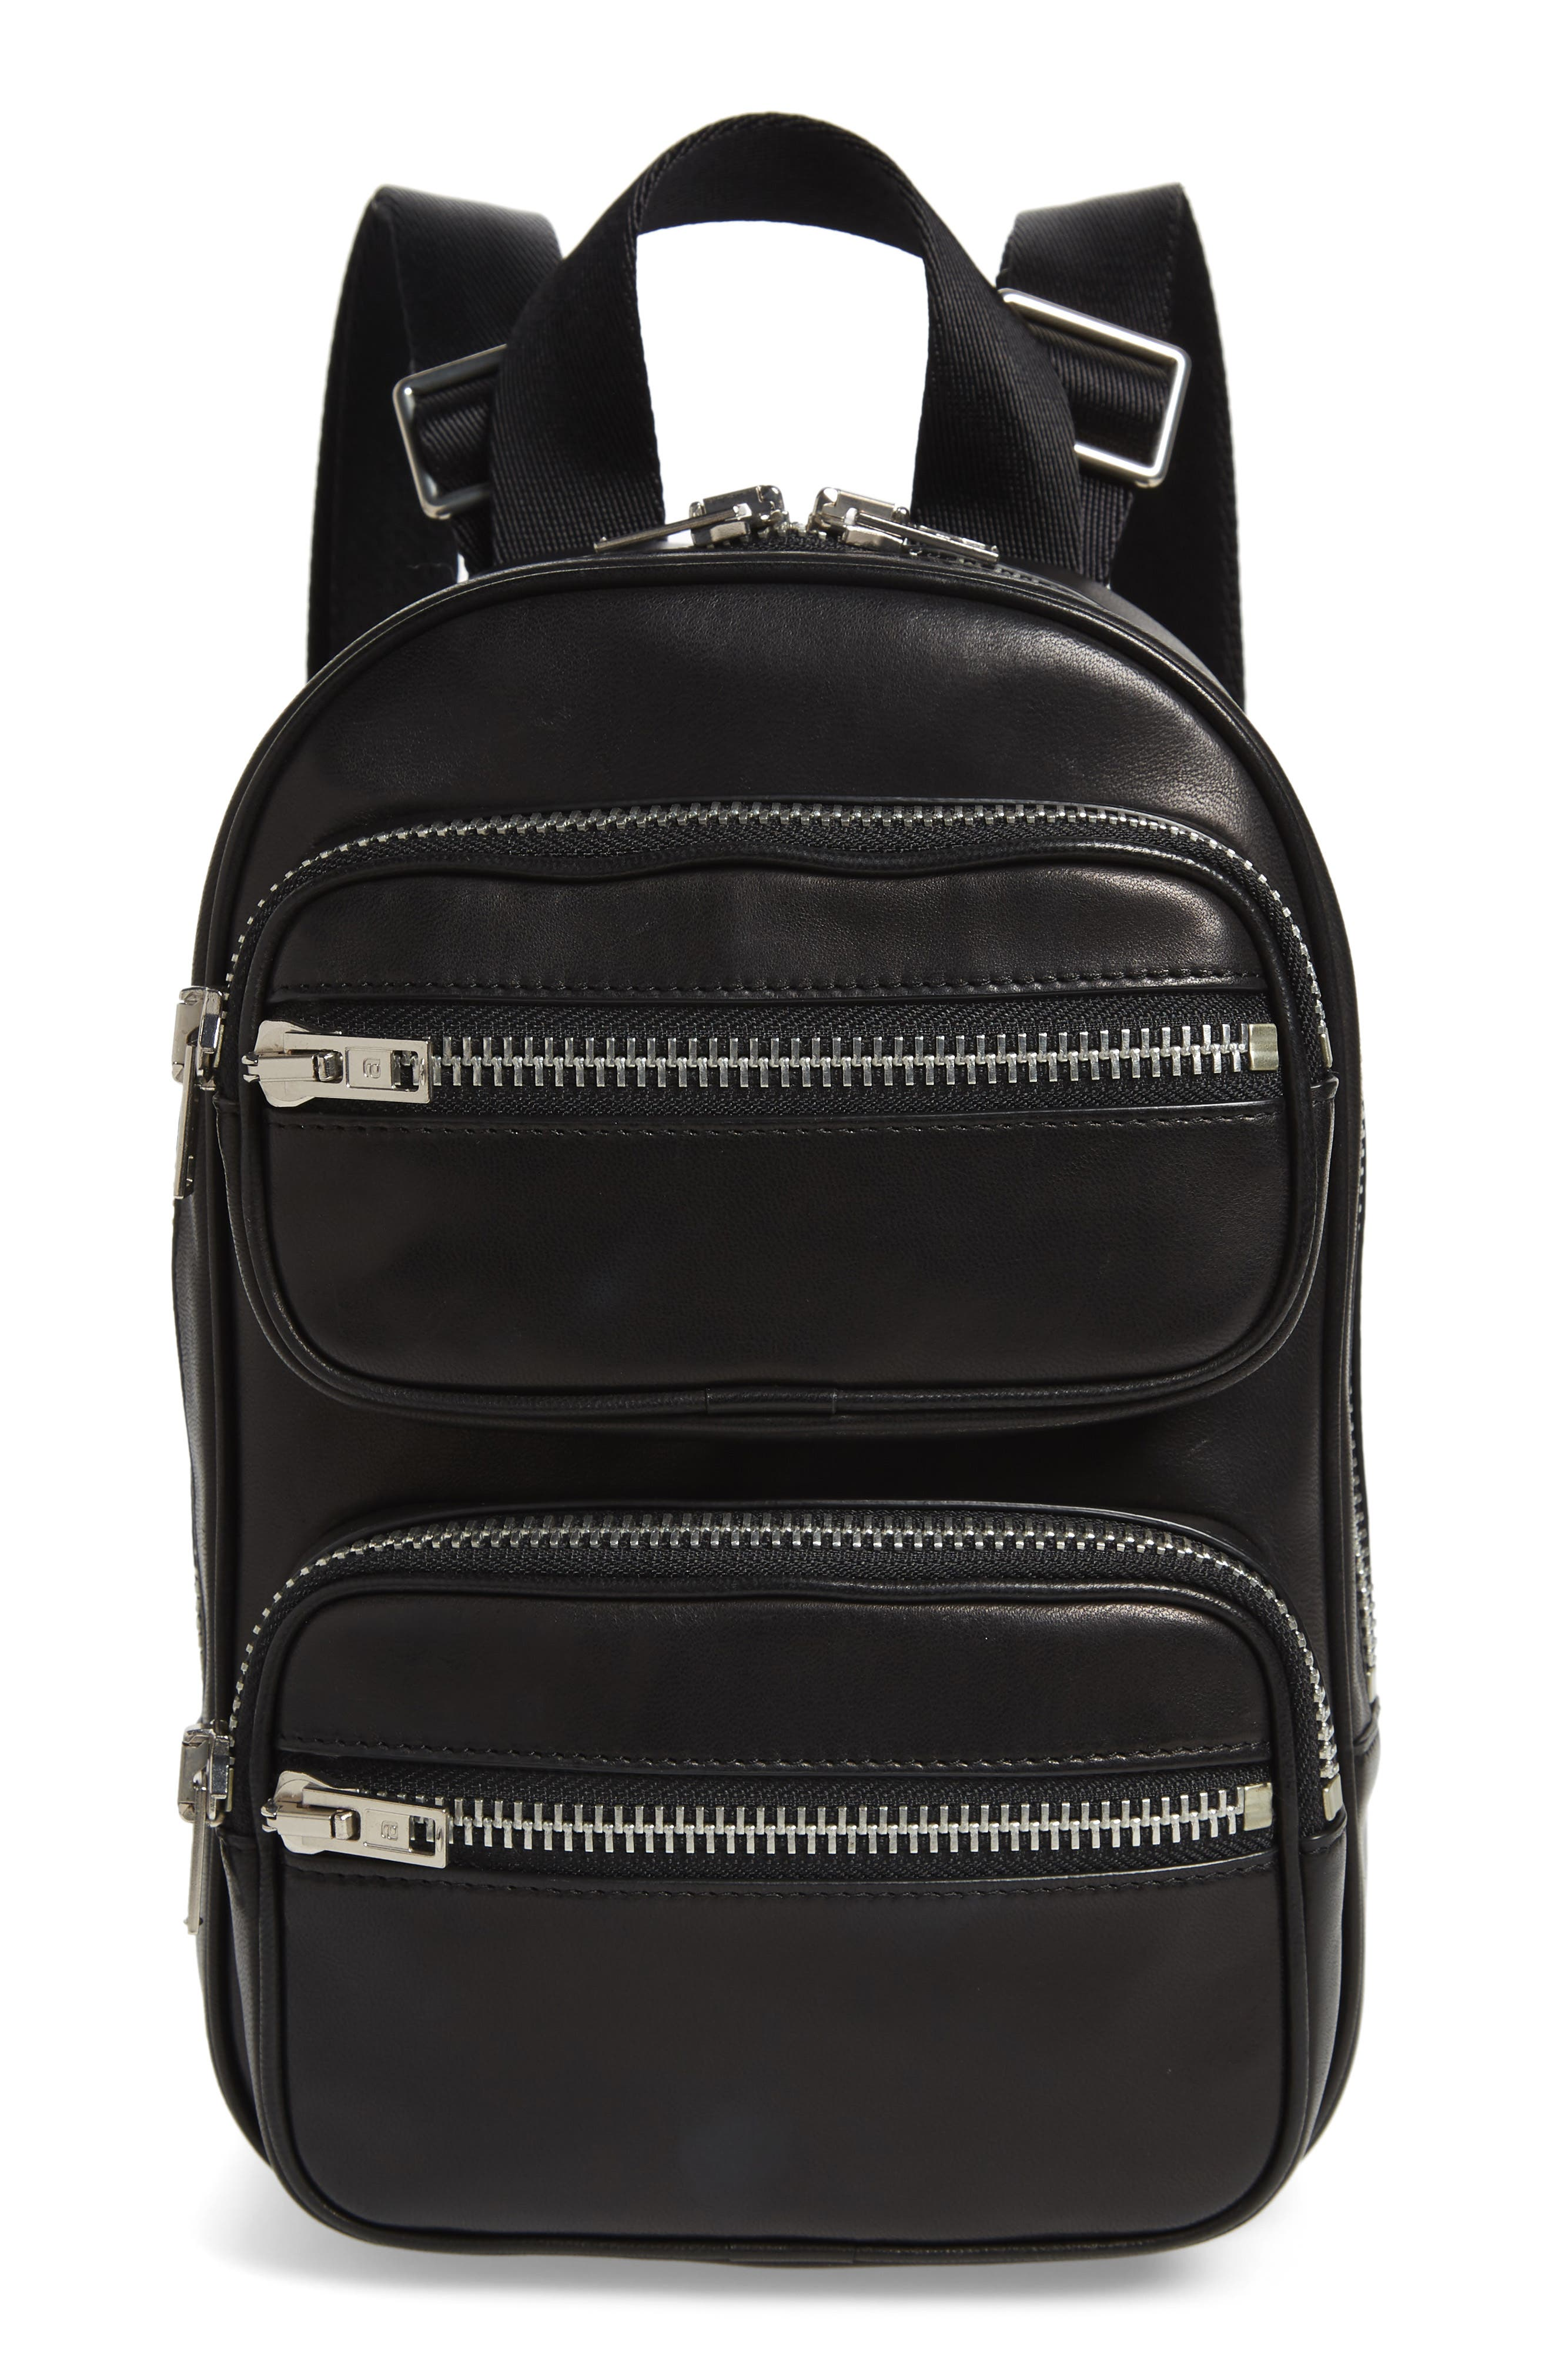 ALEXANDER WANG Attica Lambskin Leather Backpack, Main, color, BLACK